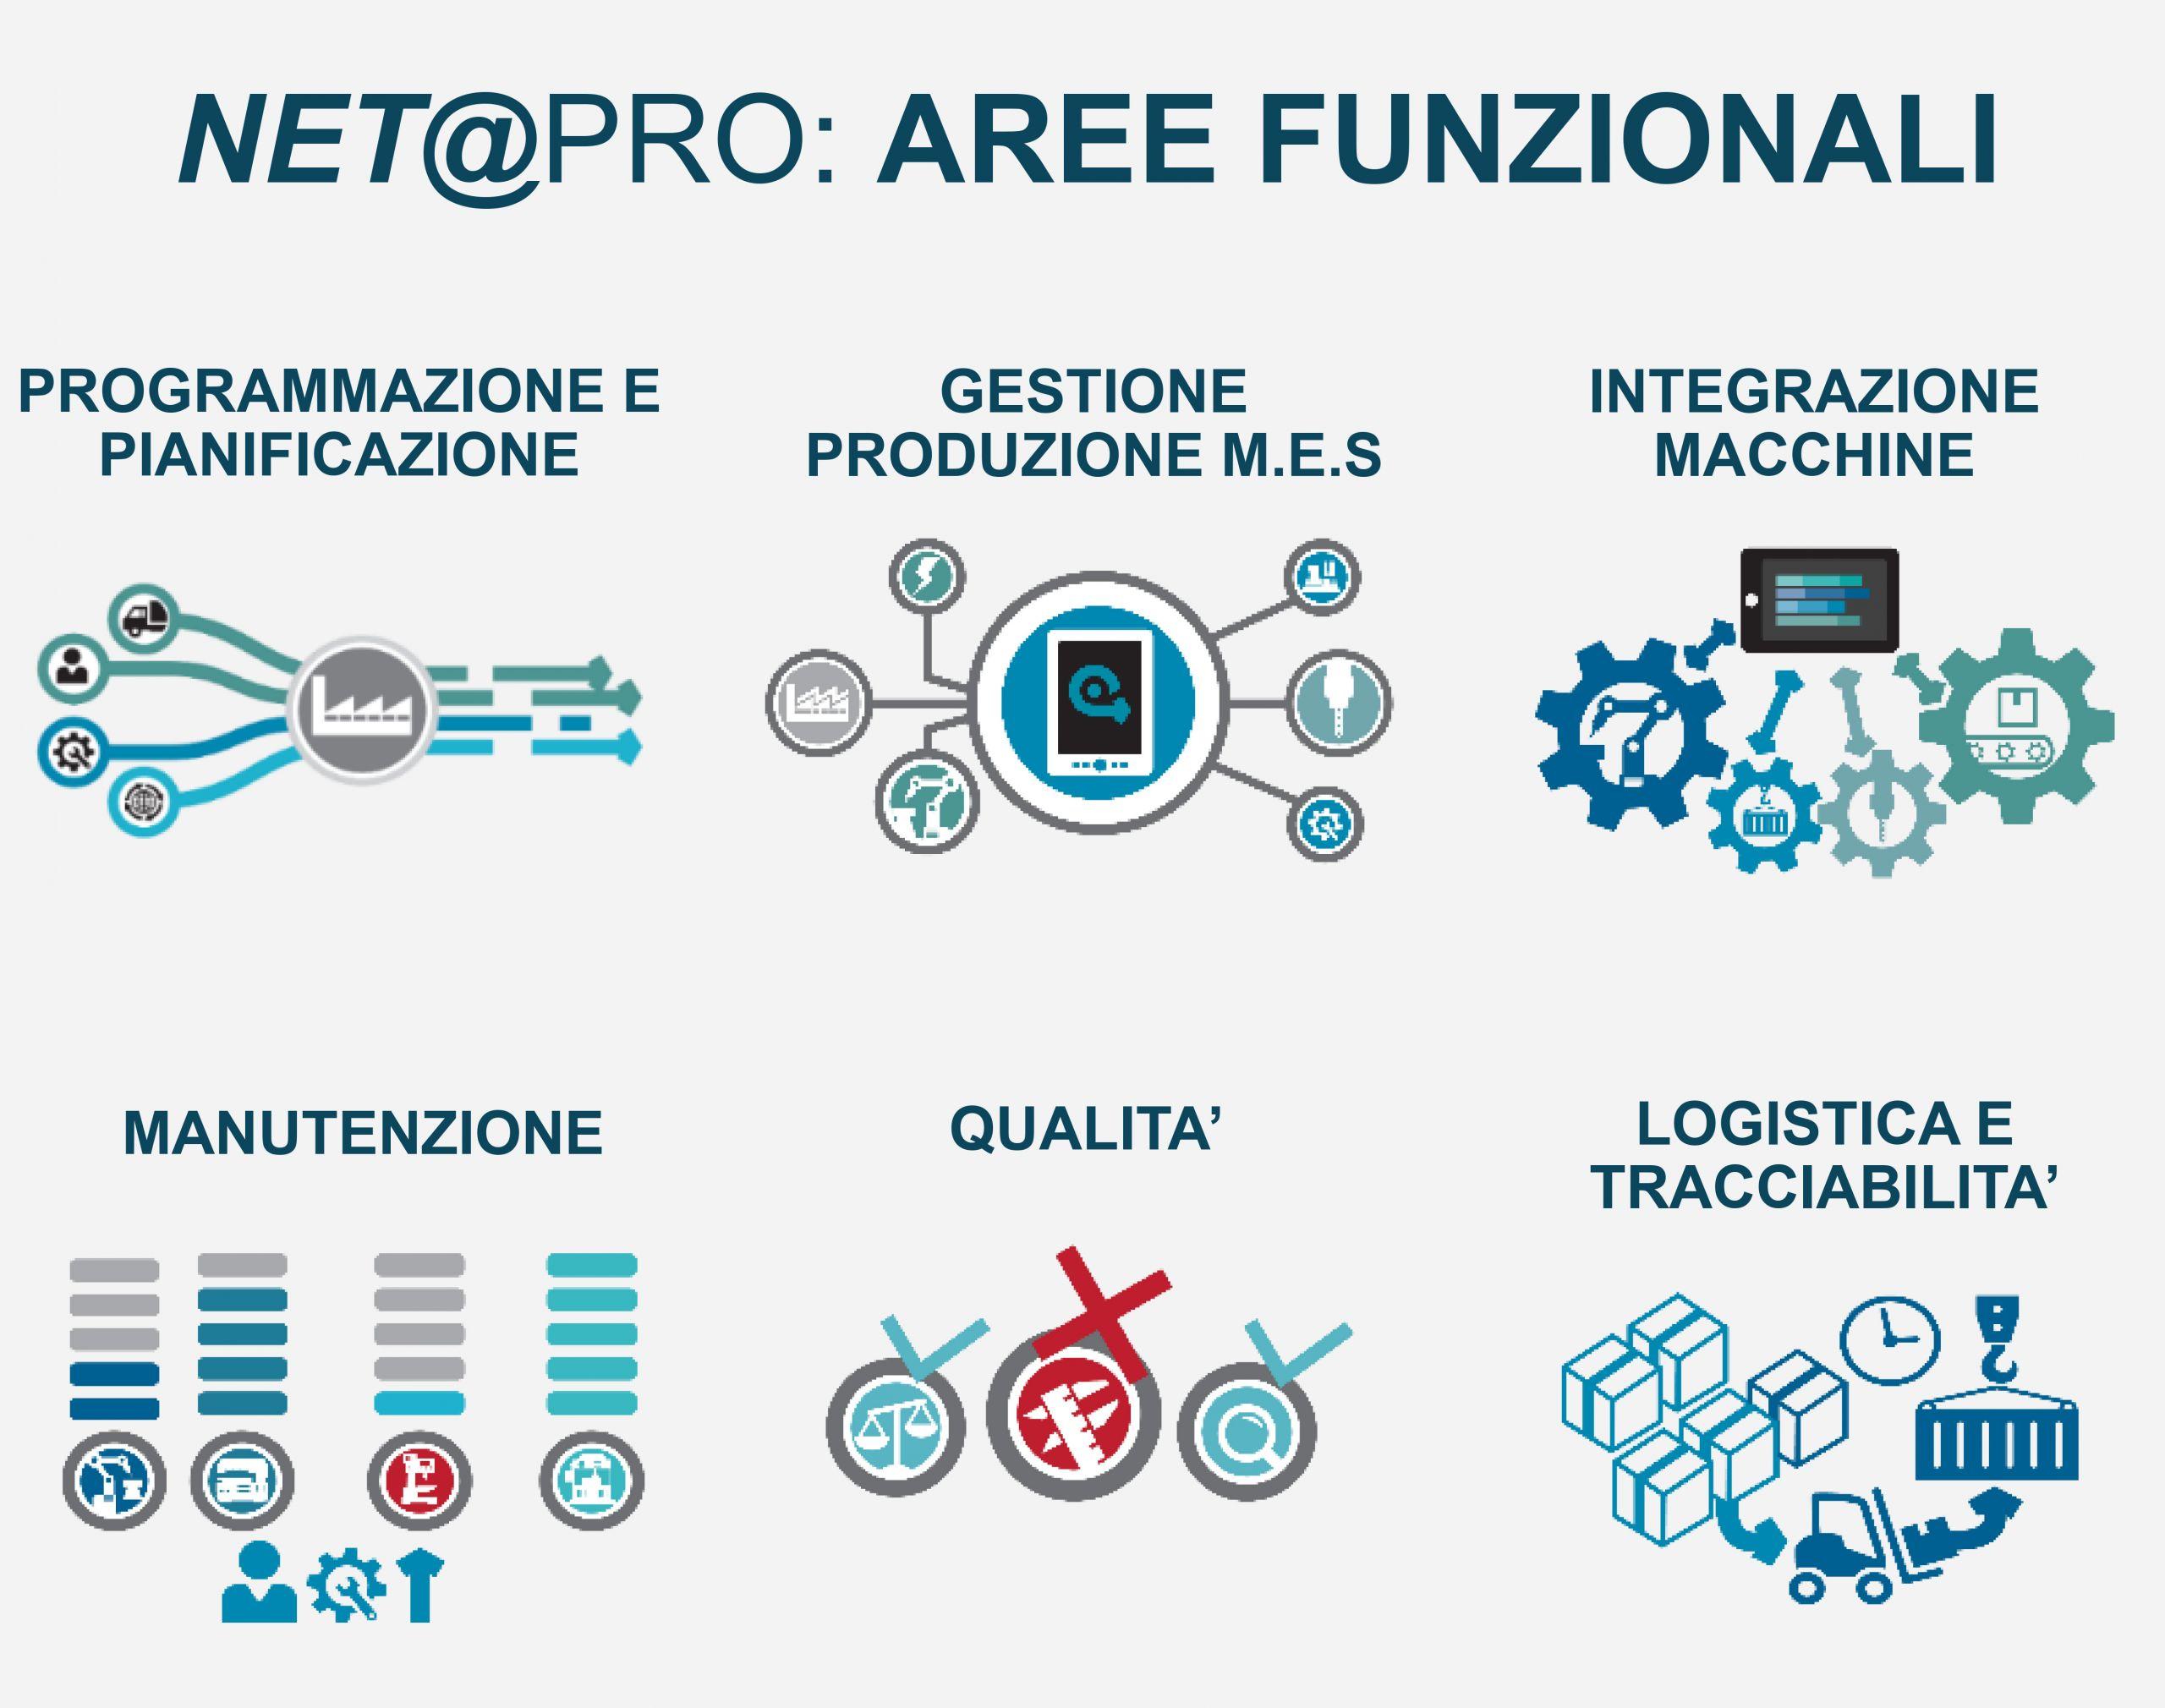 Aree funzionali di Net Pro